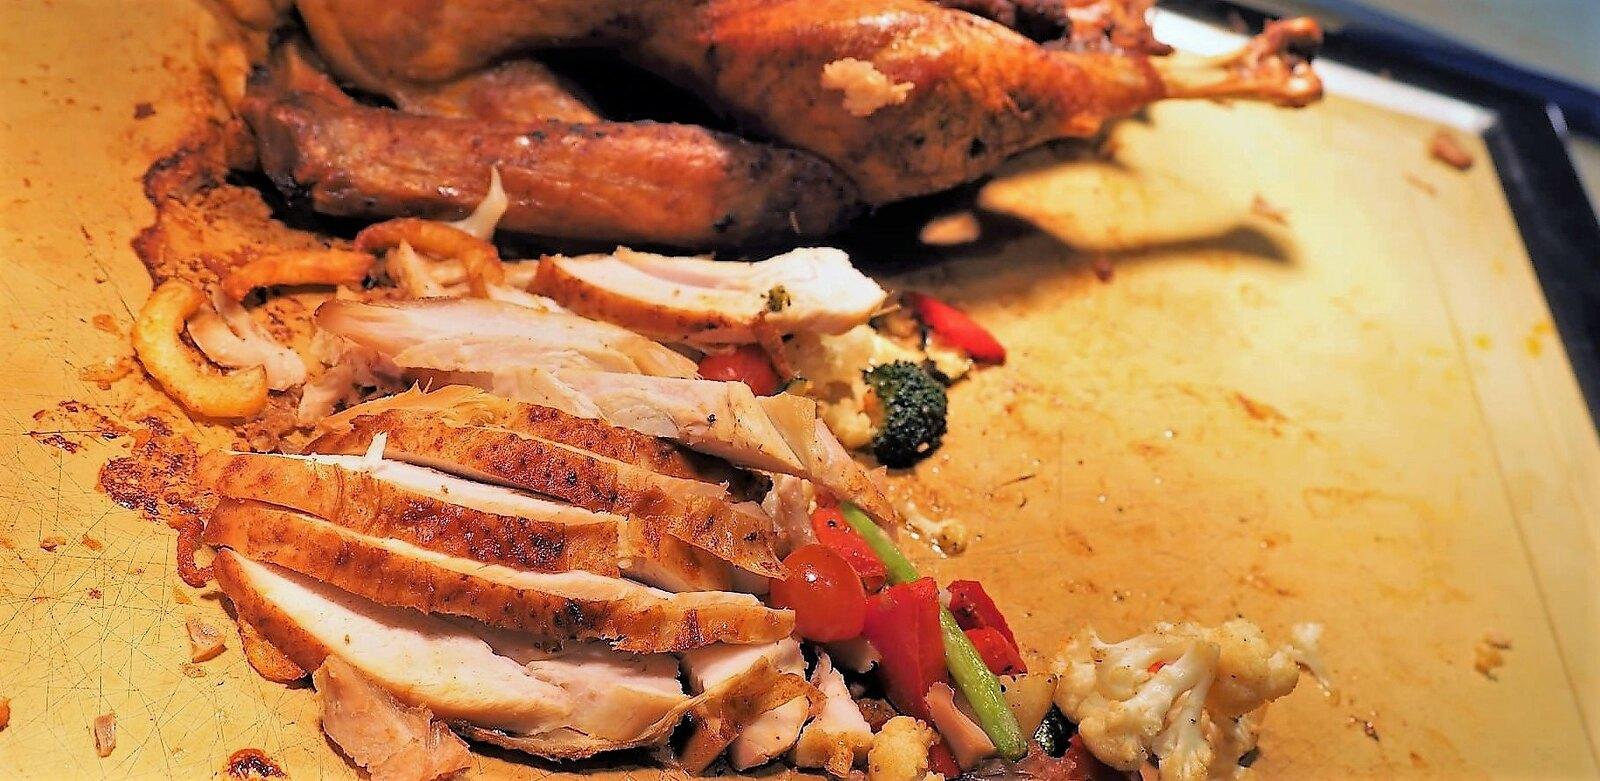 Slices of turkey breast at Feast @ Sheraton Petaling Jaya.